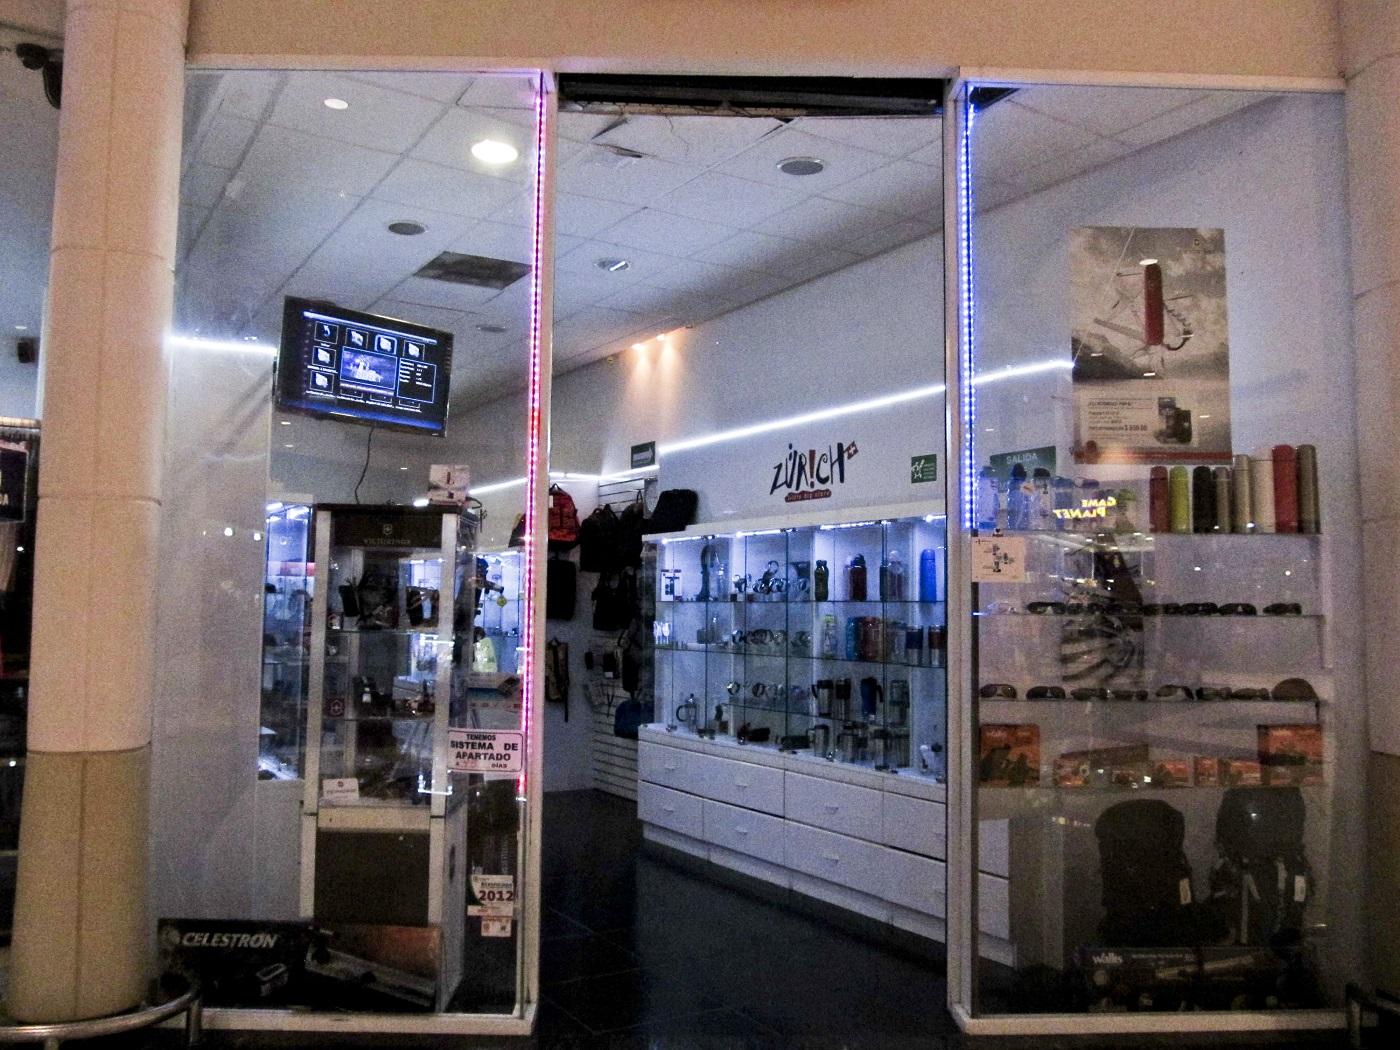 Small business digital signage - Shop